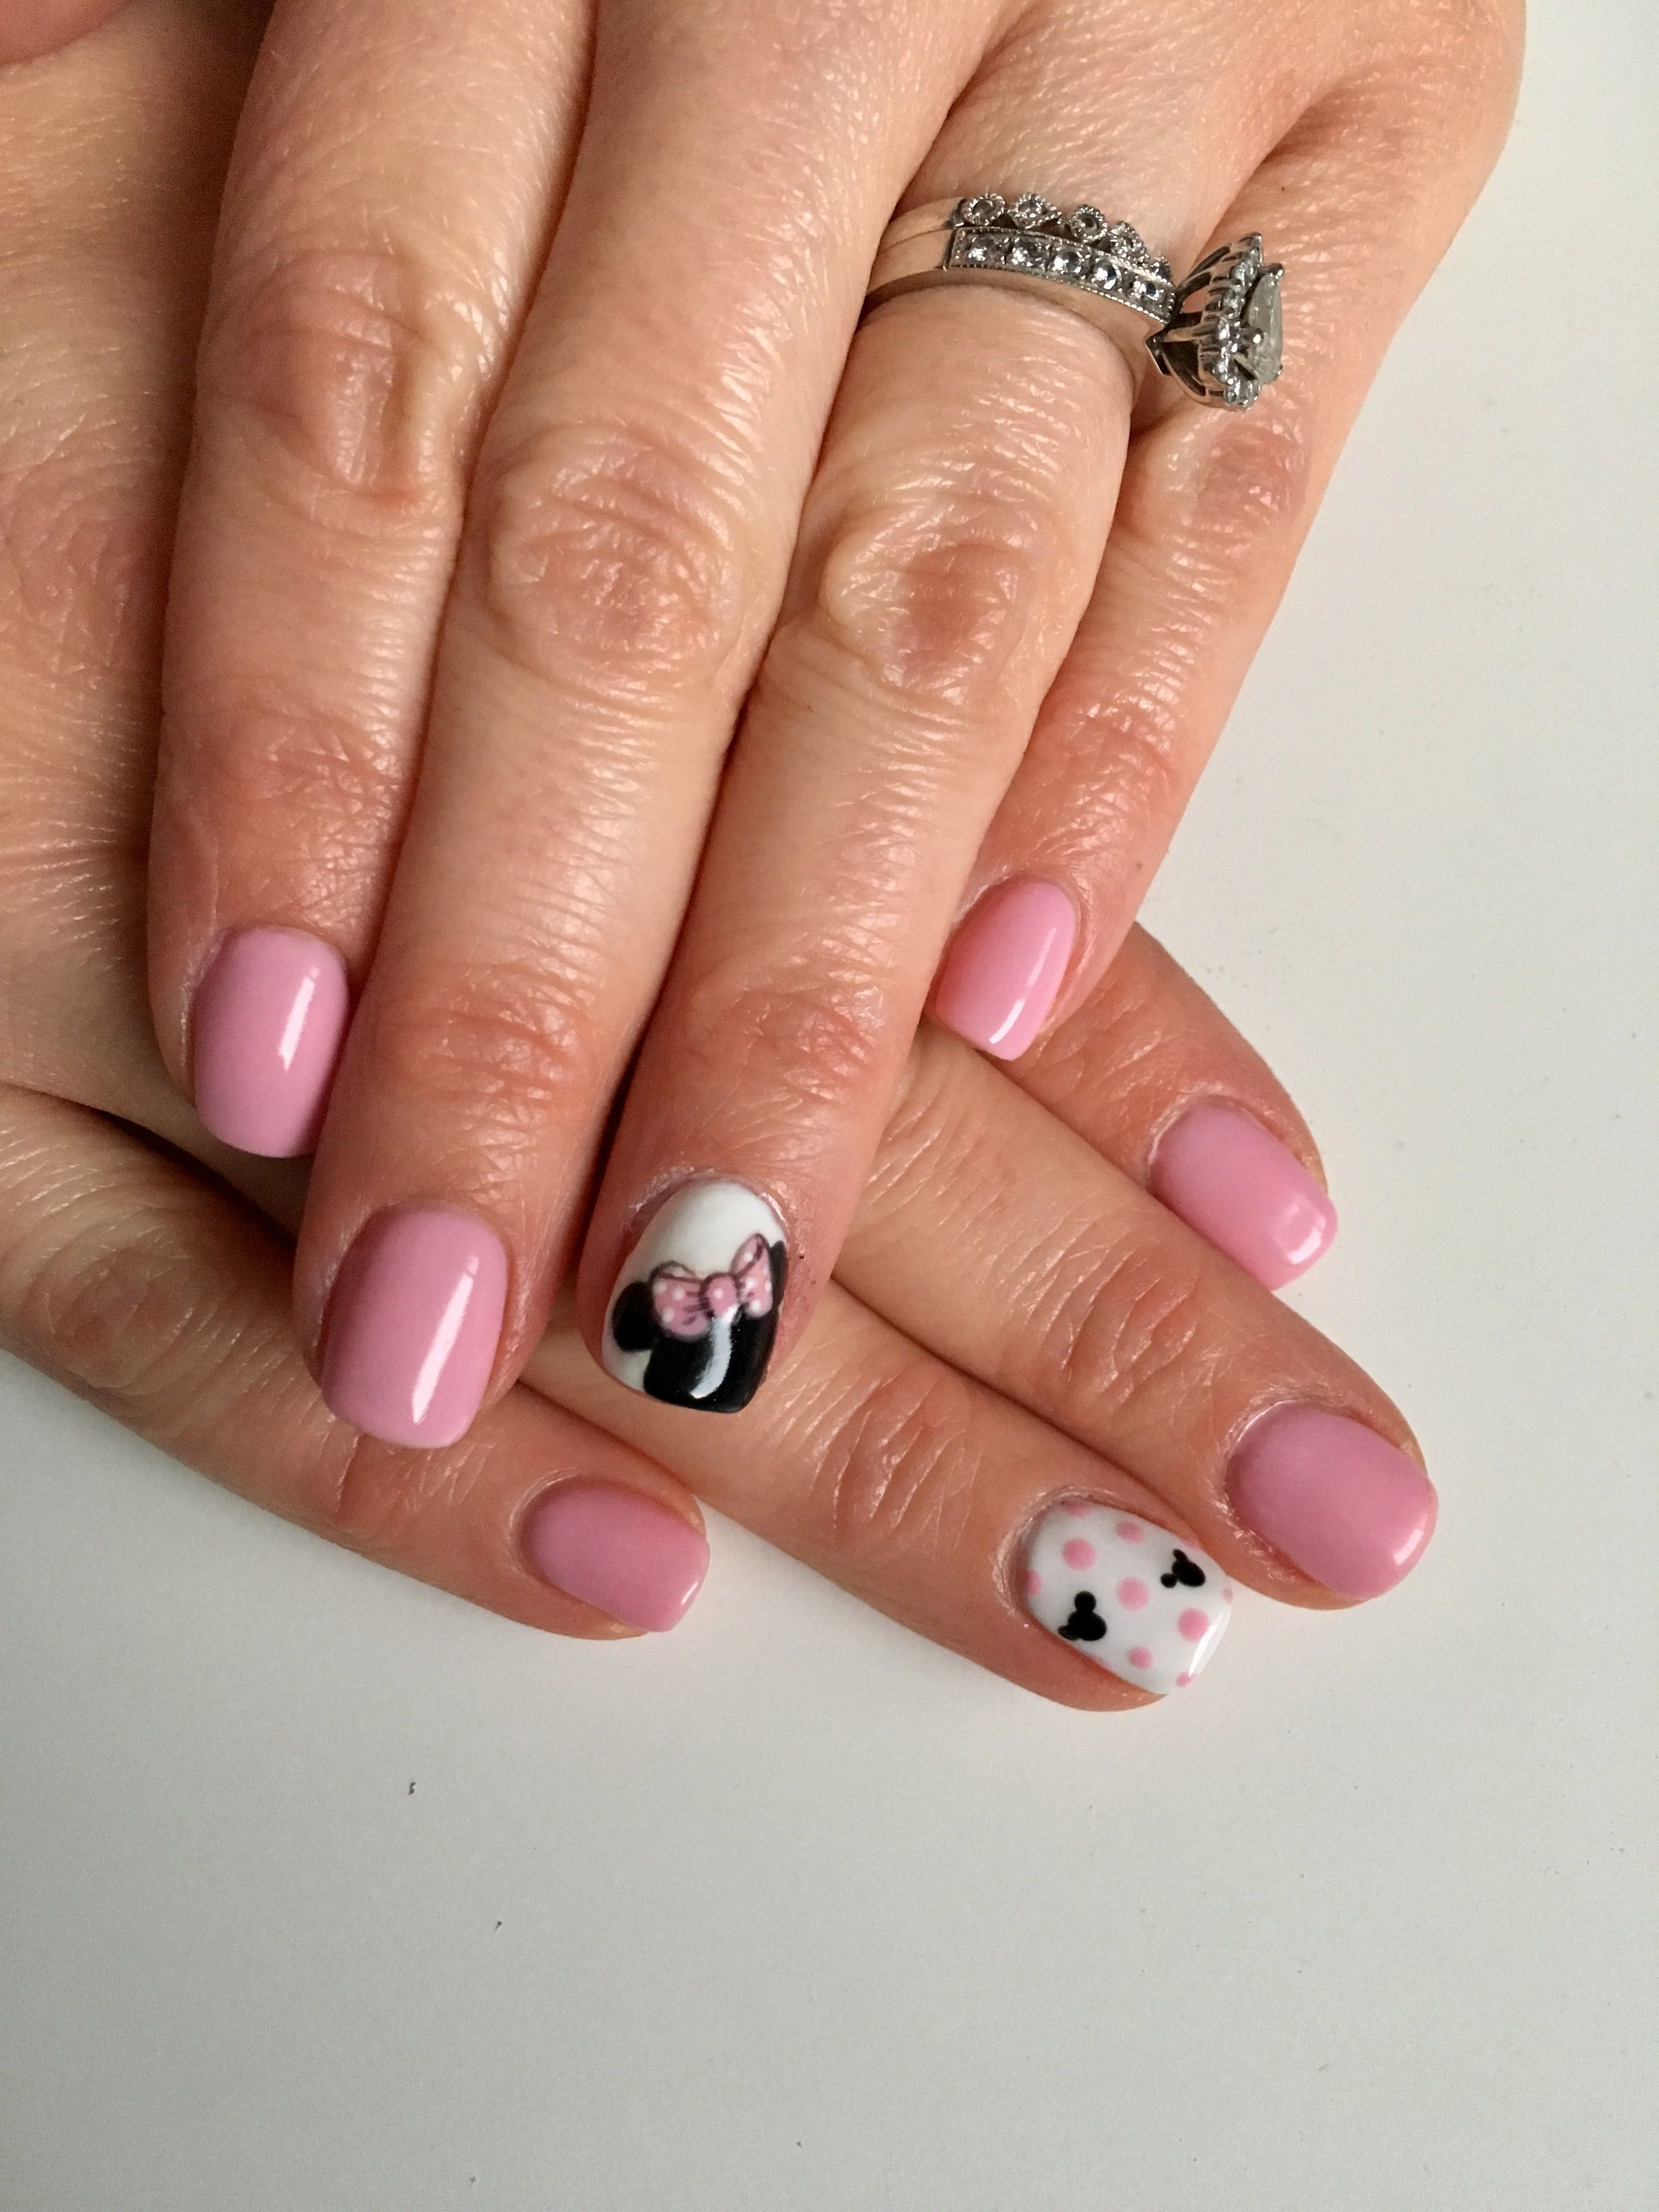 Are you looking for cute disney nail art designs 2018? Nail designs like  cute Mickey Mouse, beautiful Cinderella, and … | Mickey nägel, Disneyland  nägel, Süße nägel